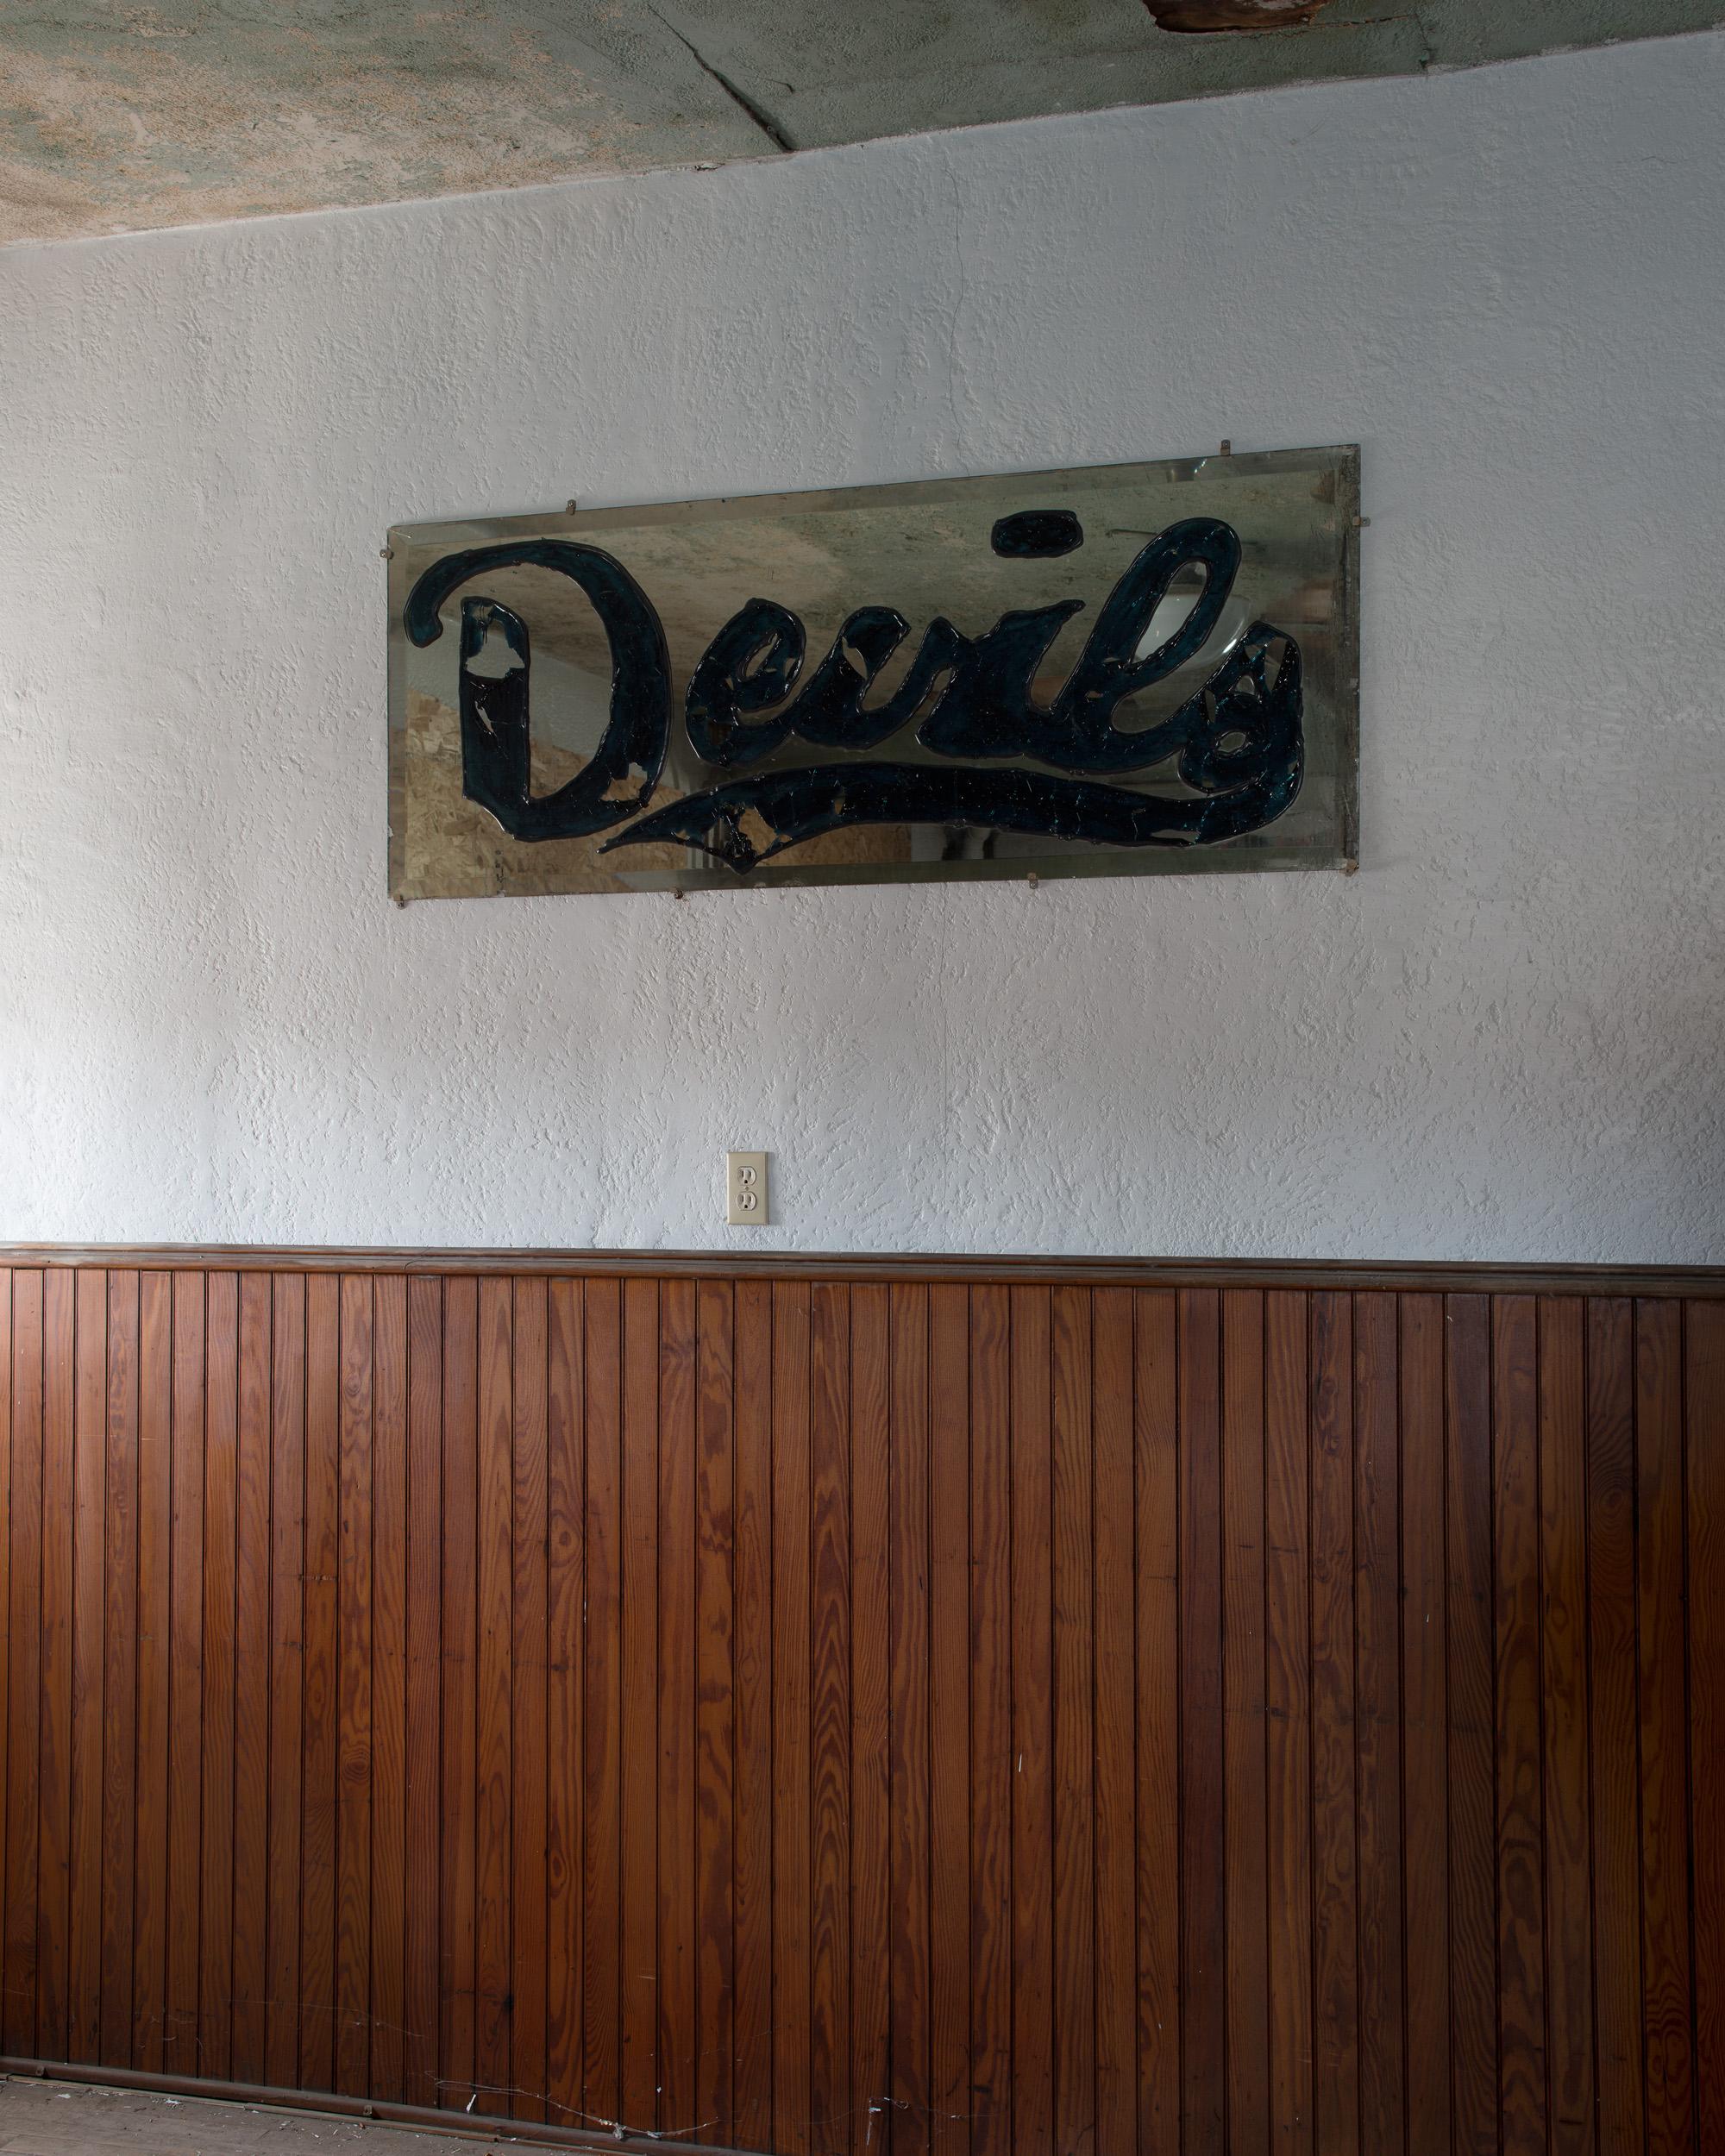 D'evils, Carrie Fashions, Shenandoah, PA, 2013